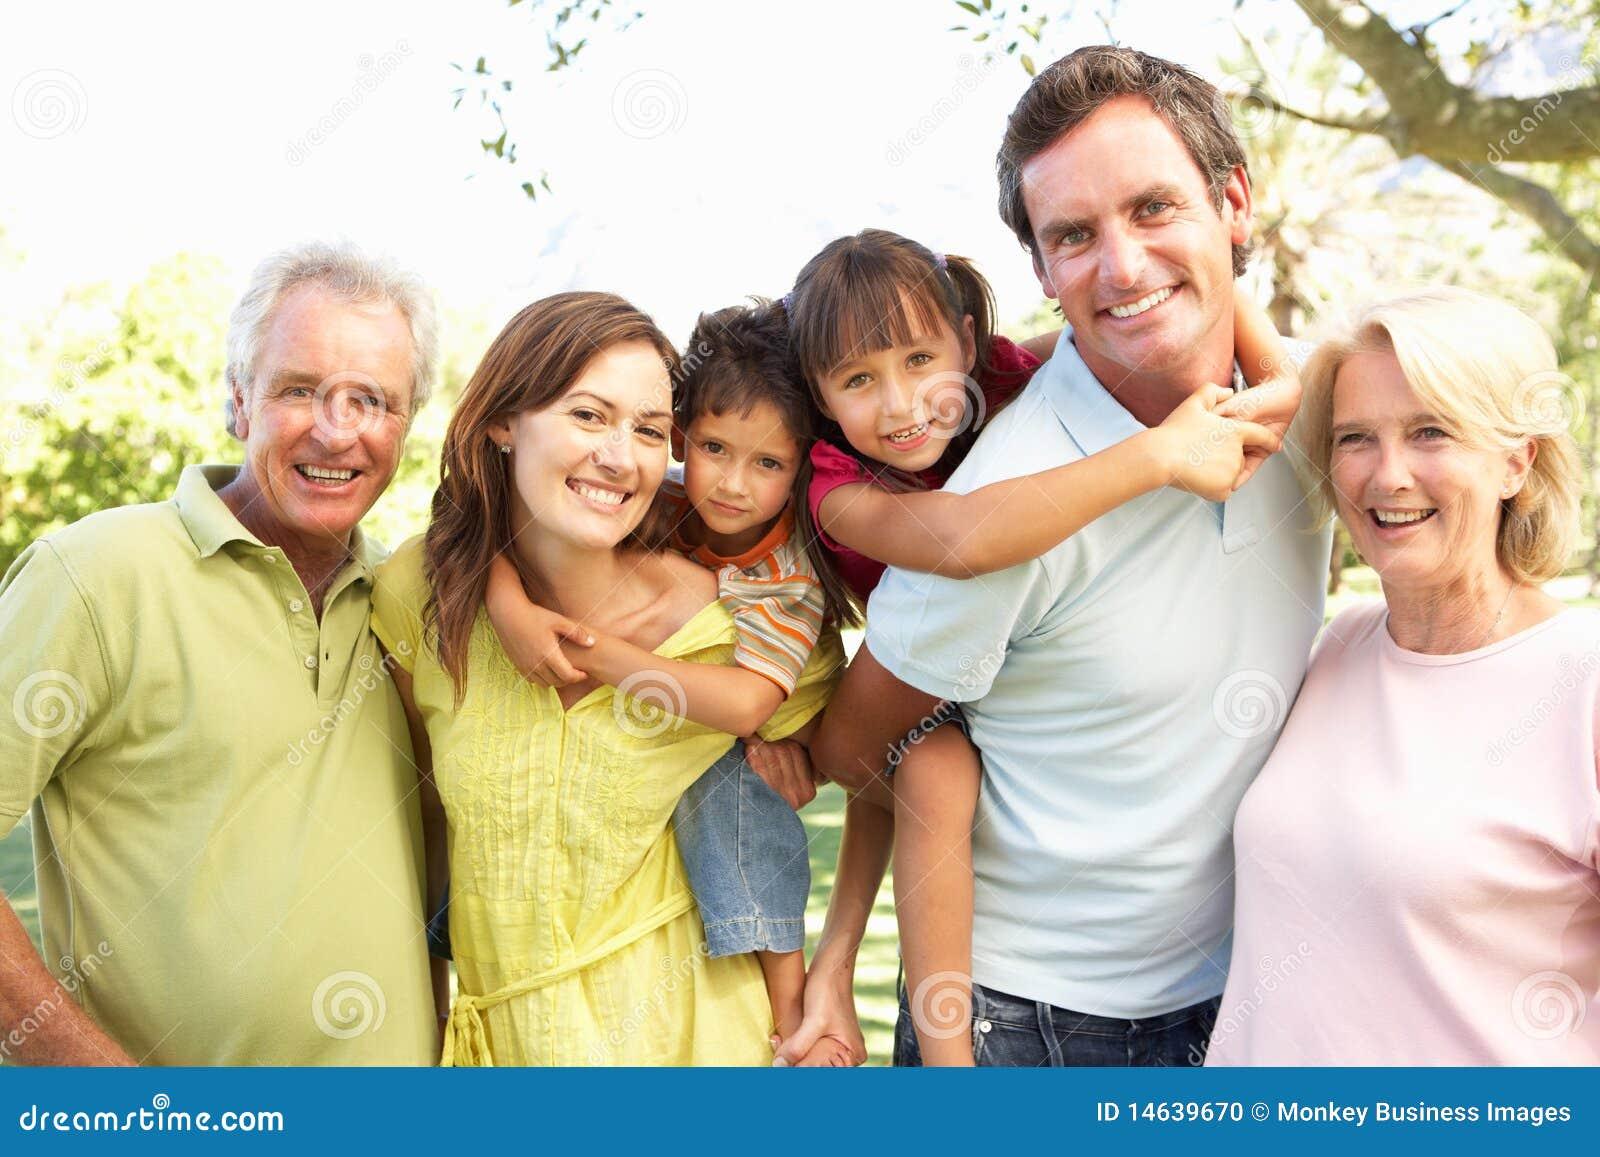 Extended Group Of Family Enjoying Day